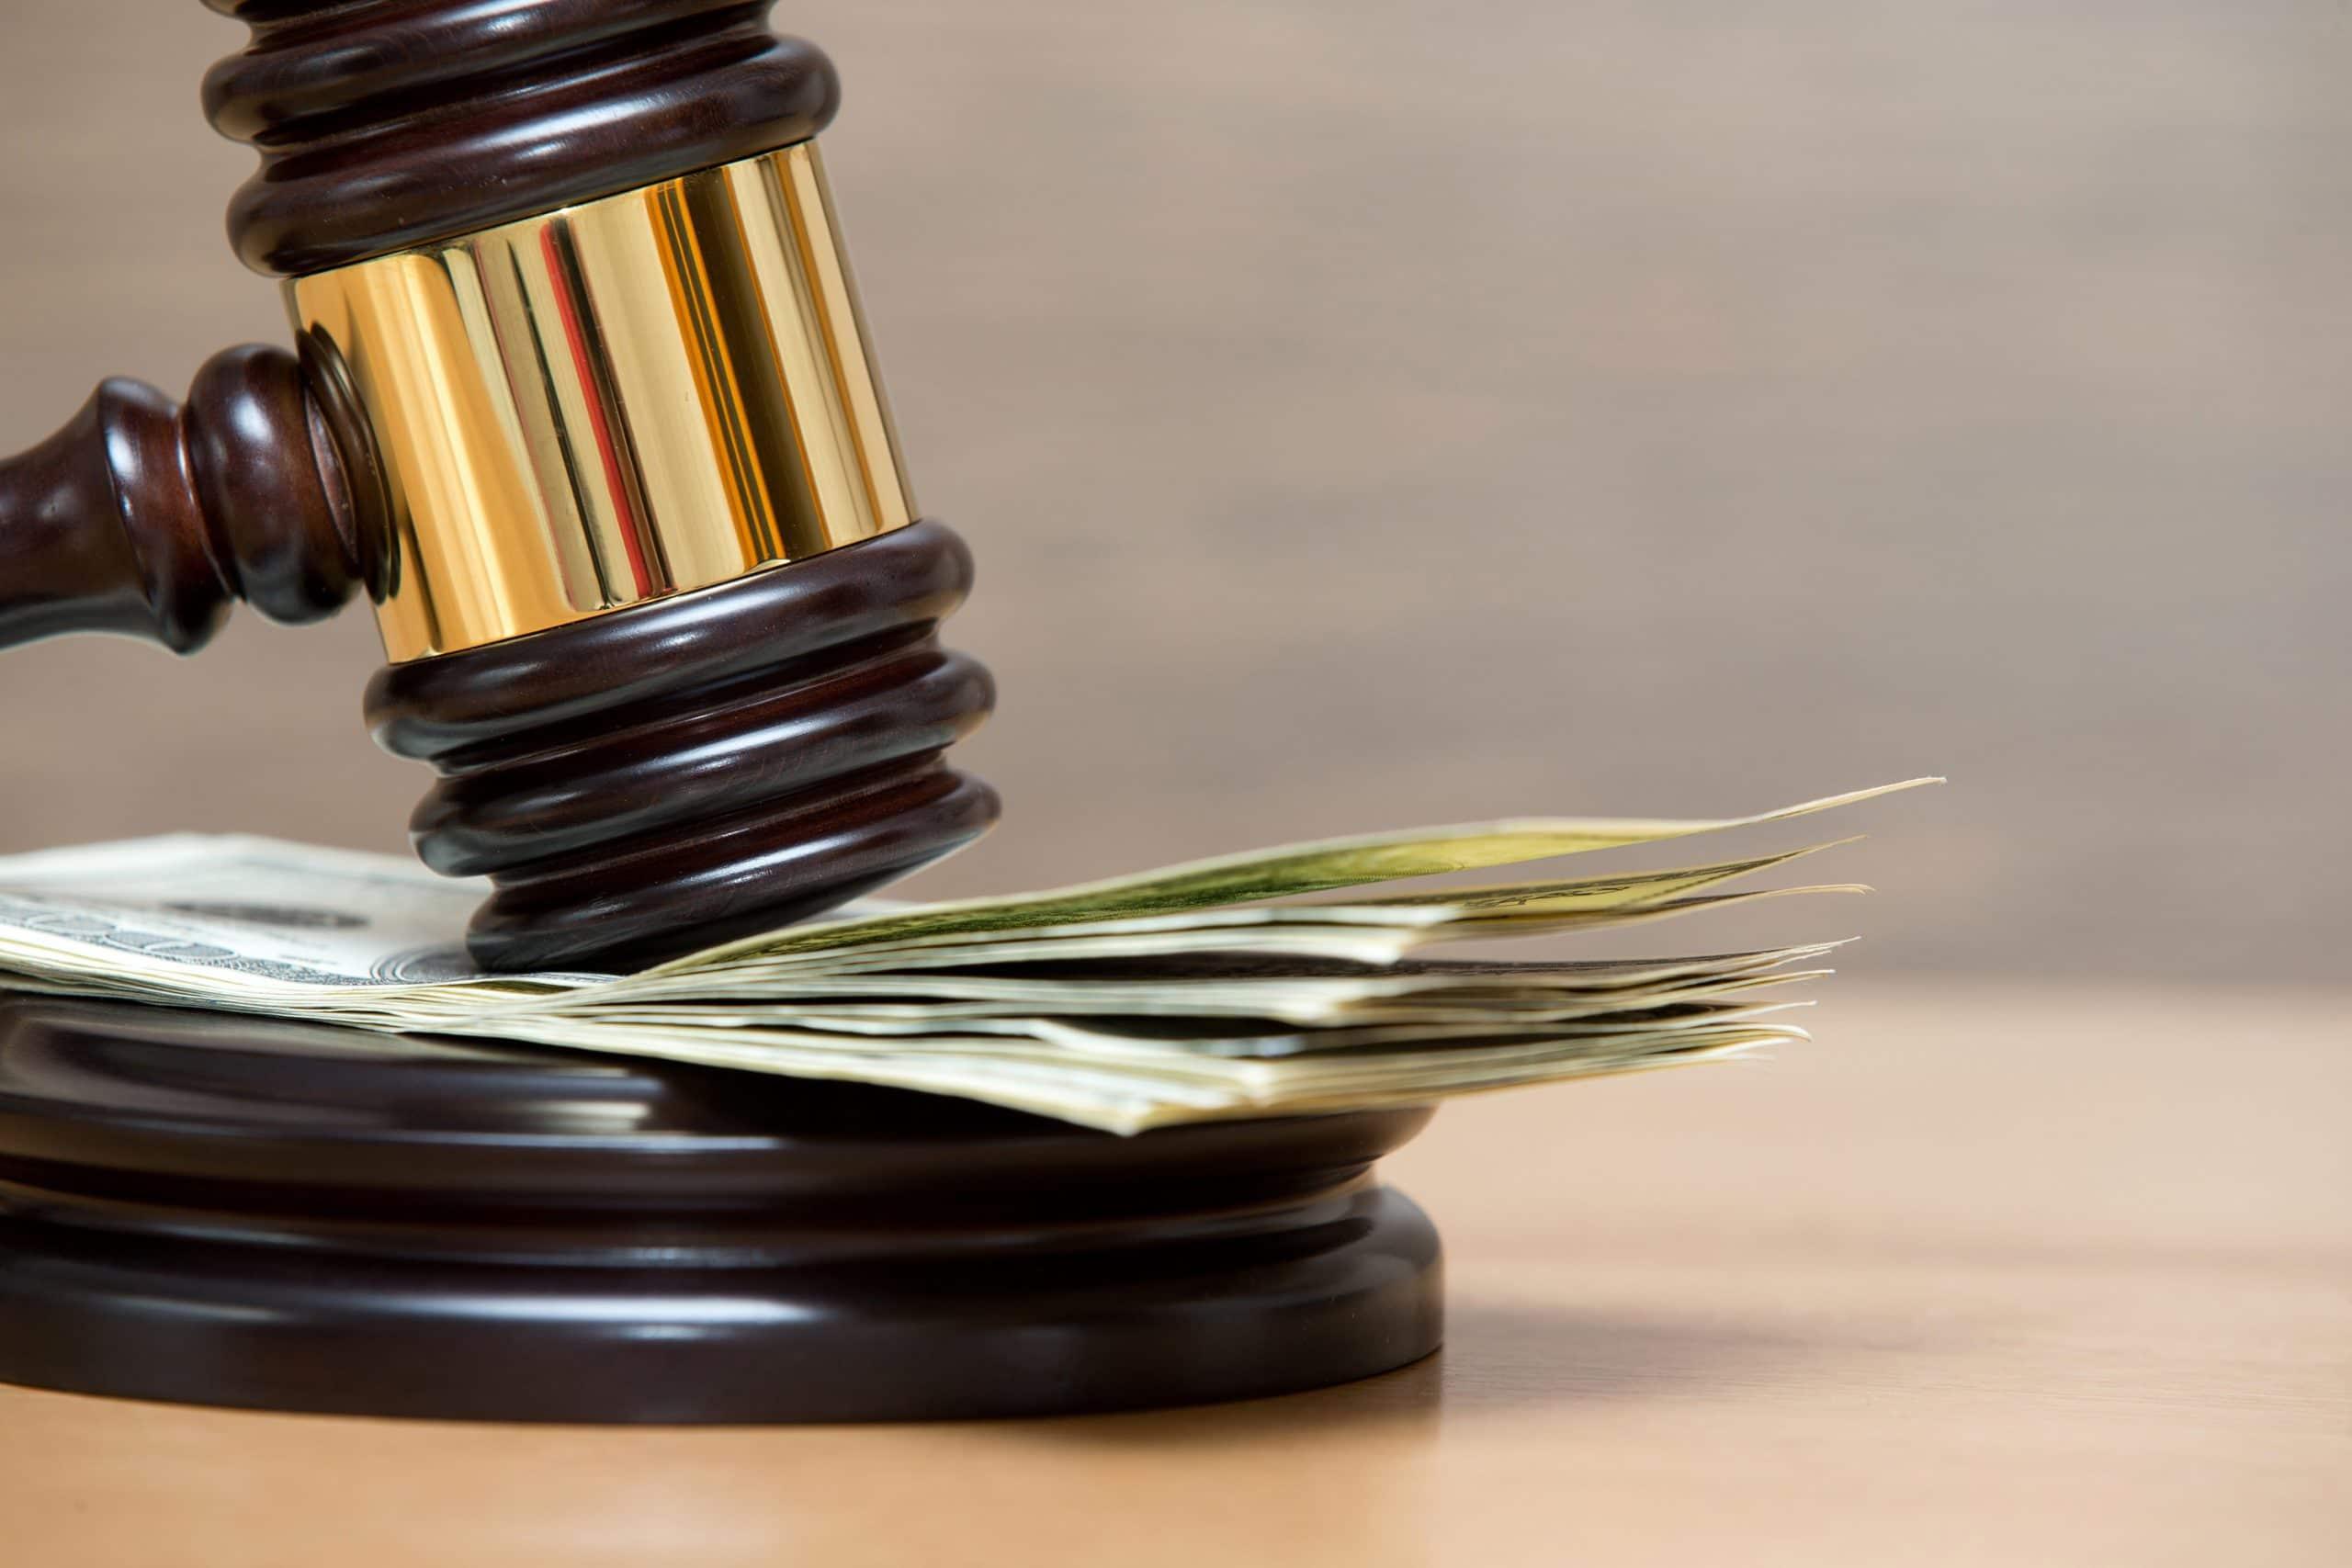 Thumbnail of Oklahoma Judge Orders Johnson & Johnson To Pay 2 Million Fine For Contributing To Opioid Crisis